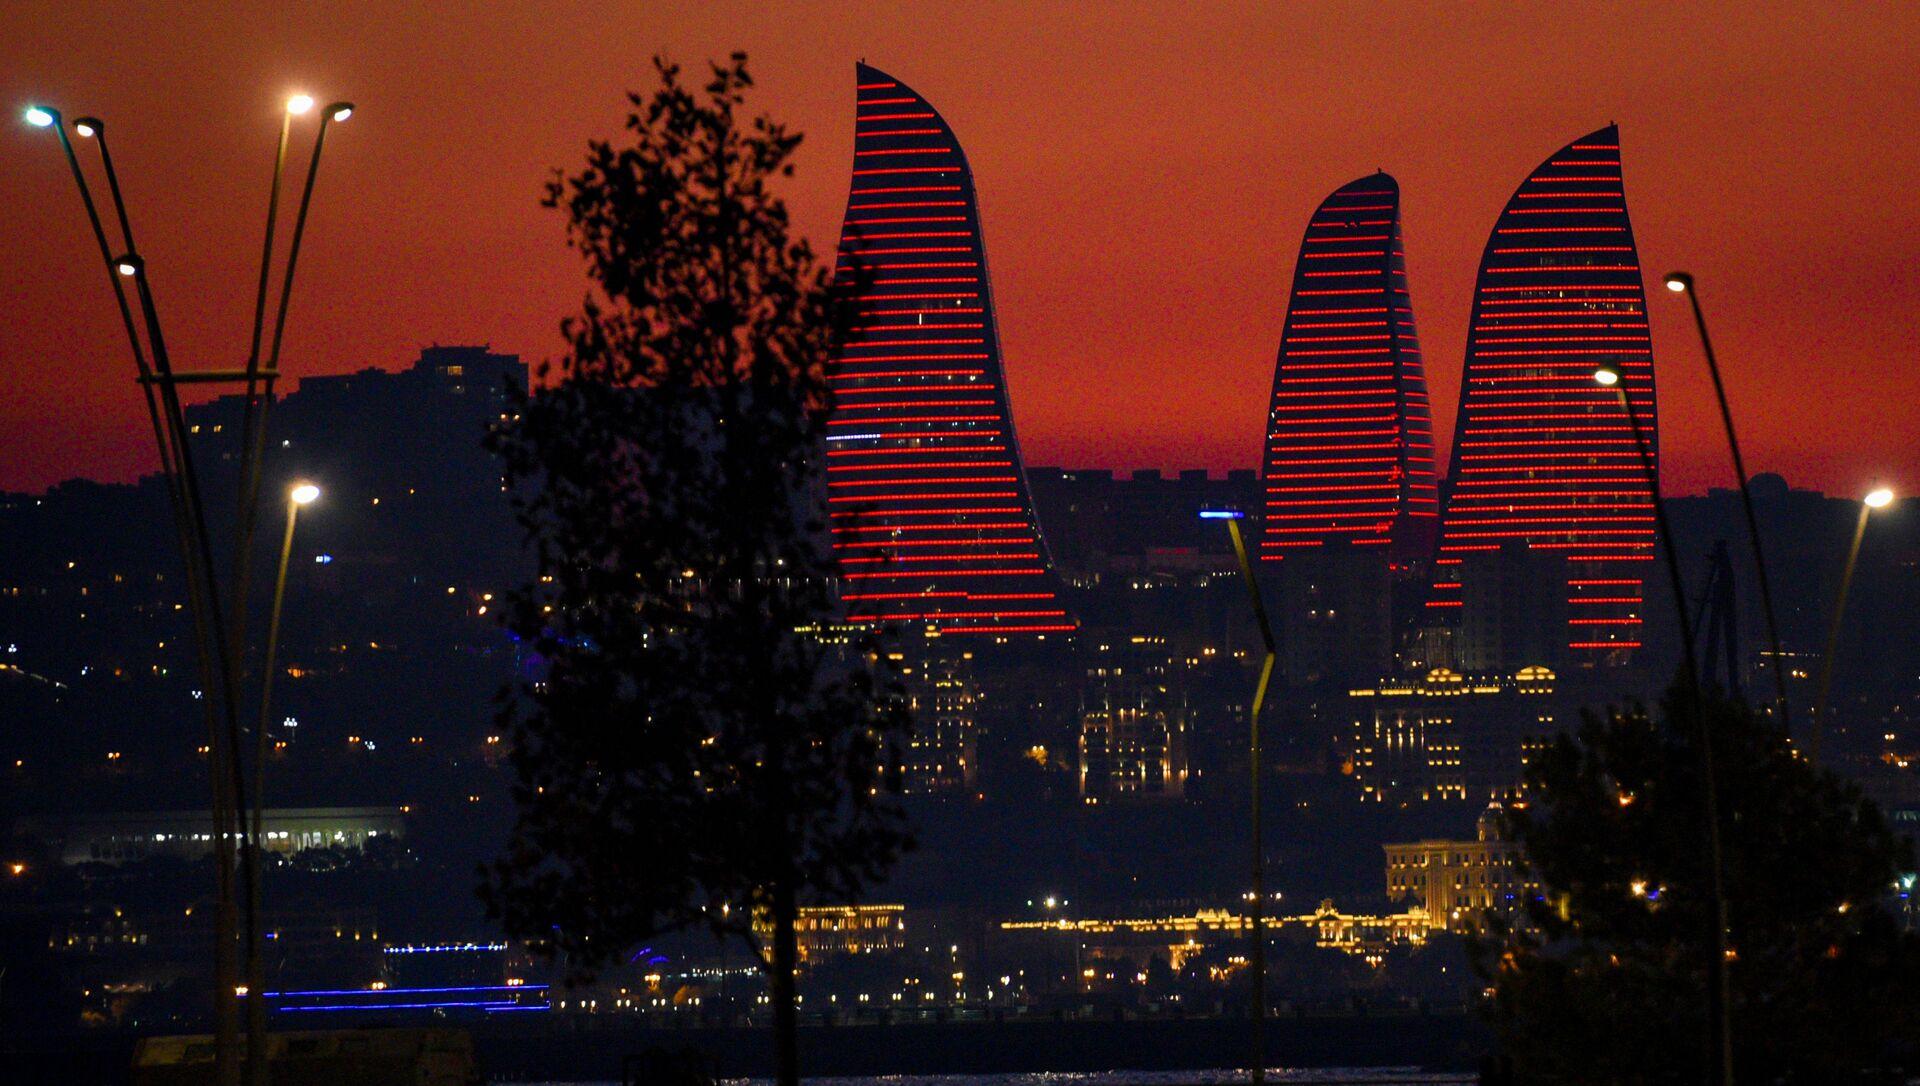 Вид на Баку, фото из архива - Sputnik Азербайджан, 1920, 05.07.2021